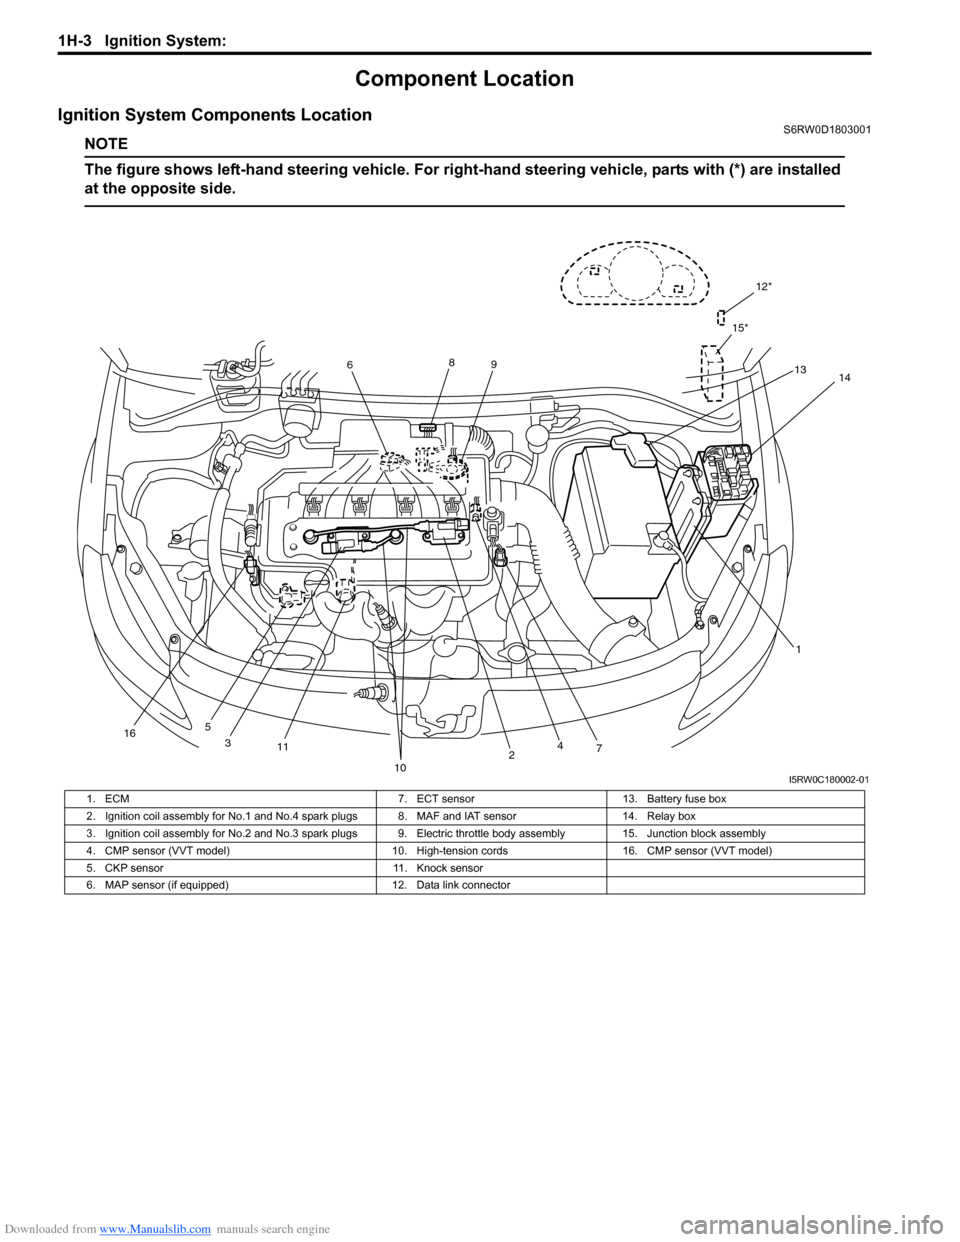 Suzuki Sx4 Fuse Box Diagram Wiring Library. Suzuki Sx4 2006 1g Service Workshop Manual Page 398. Suzuki. 2008 Suzuki Xl7 Knock Sensor Diagram At Scoala.co